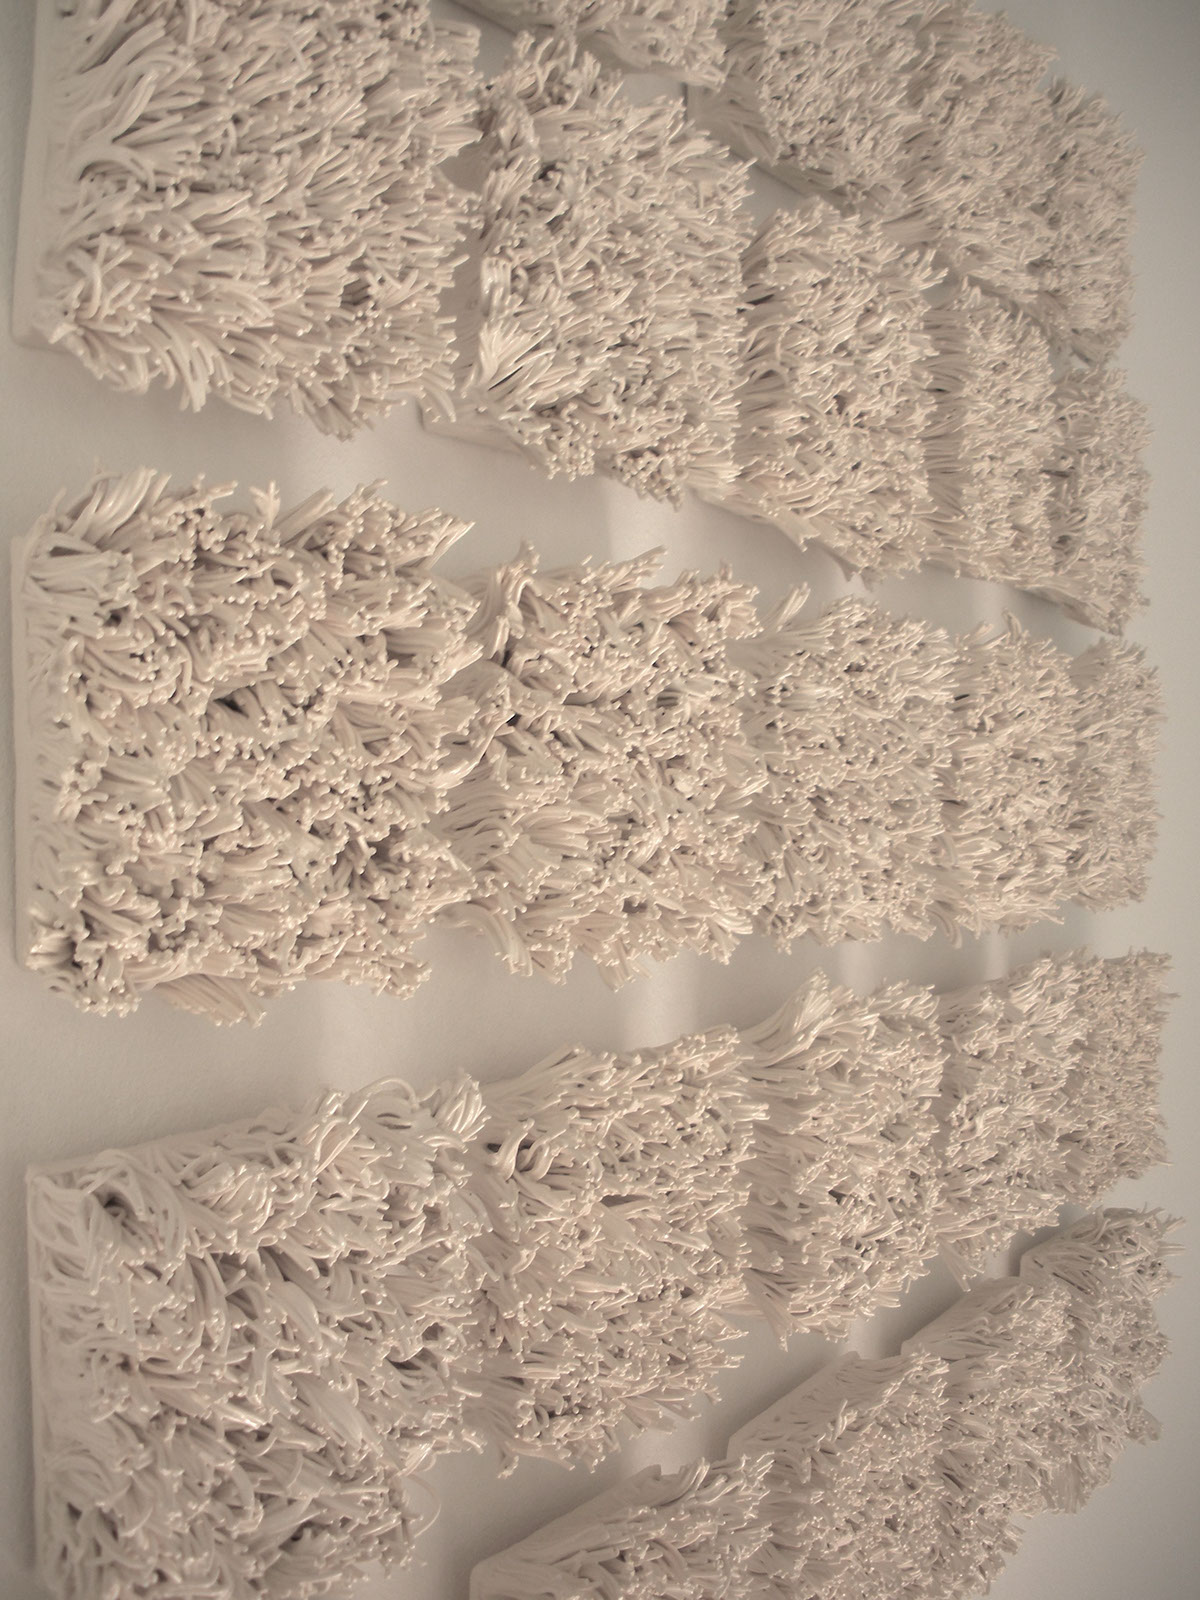 Ceramic Tile Installation : Bloom ceramic tile wall installation on behance